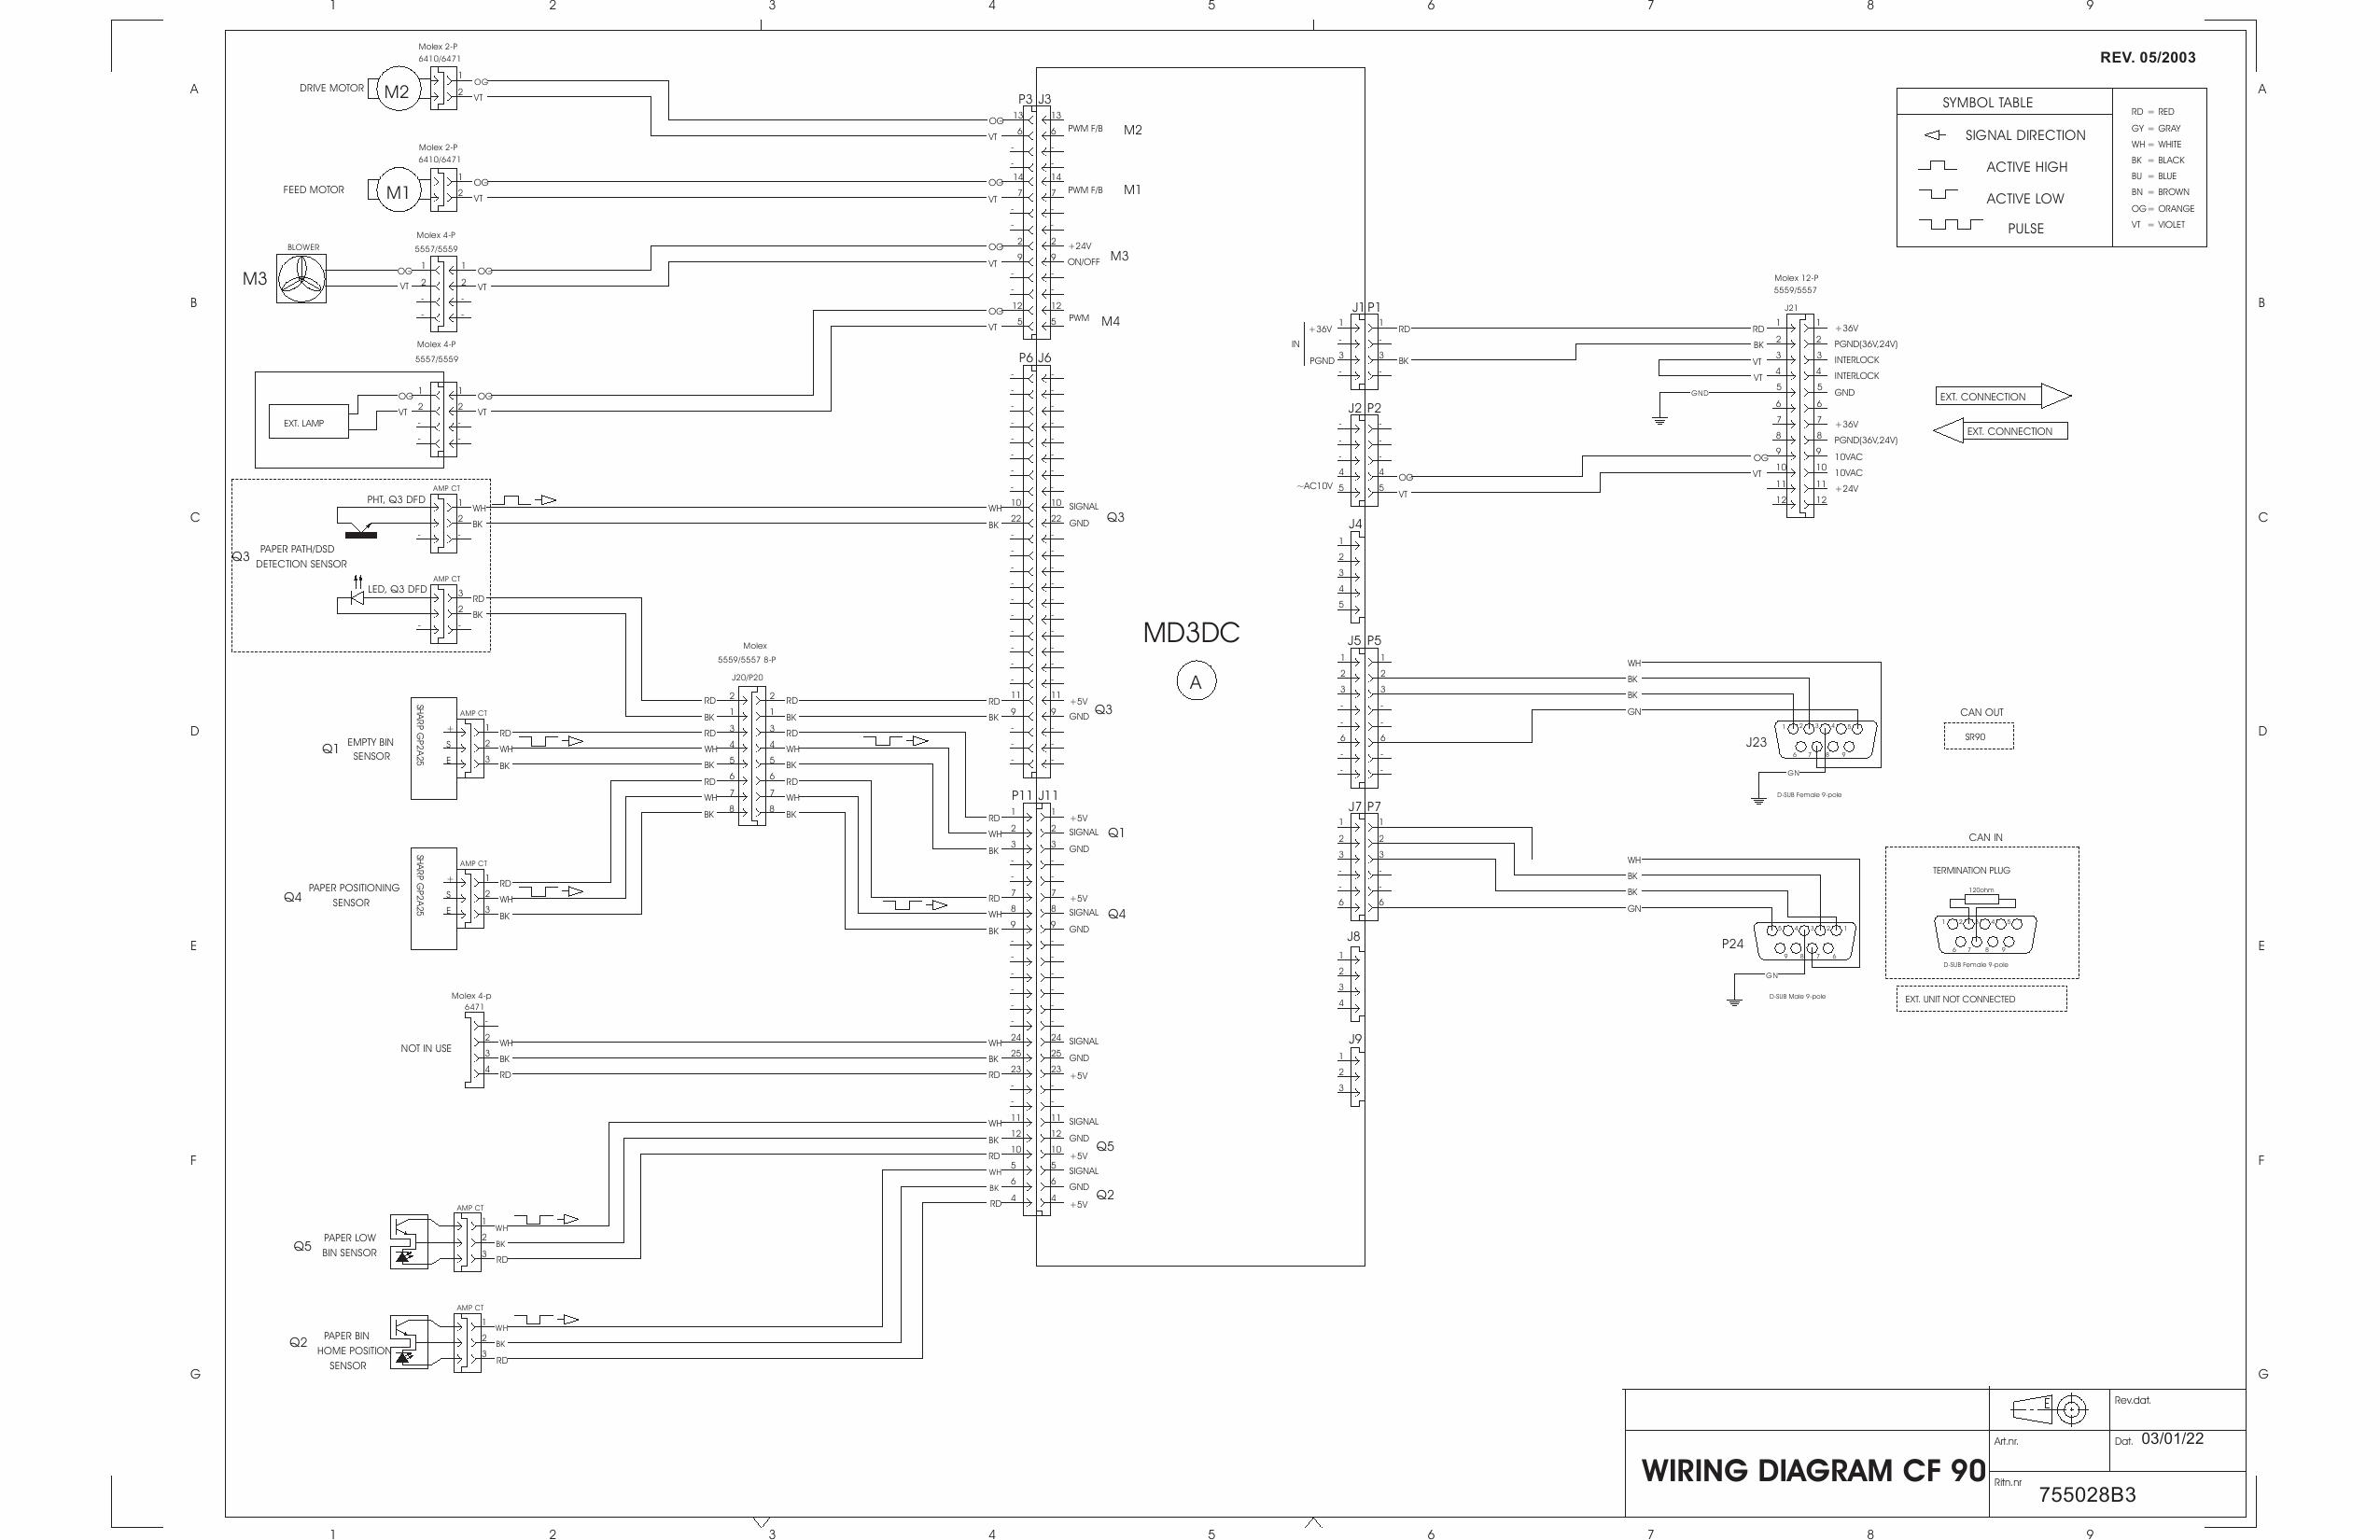 Ricoh Options Sr90 Circuit Diagram Download